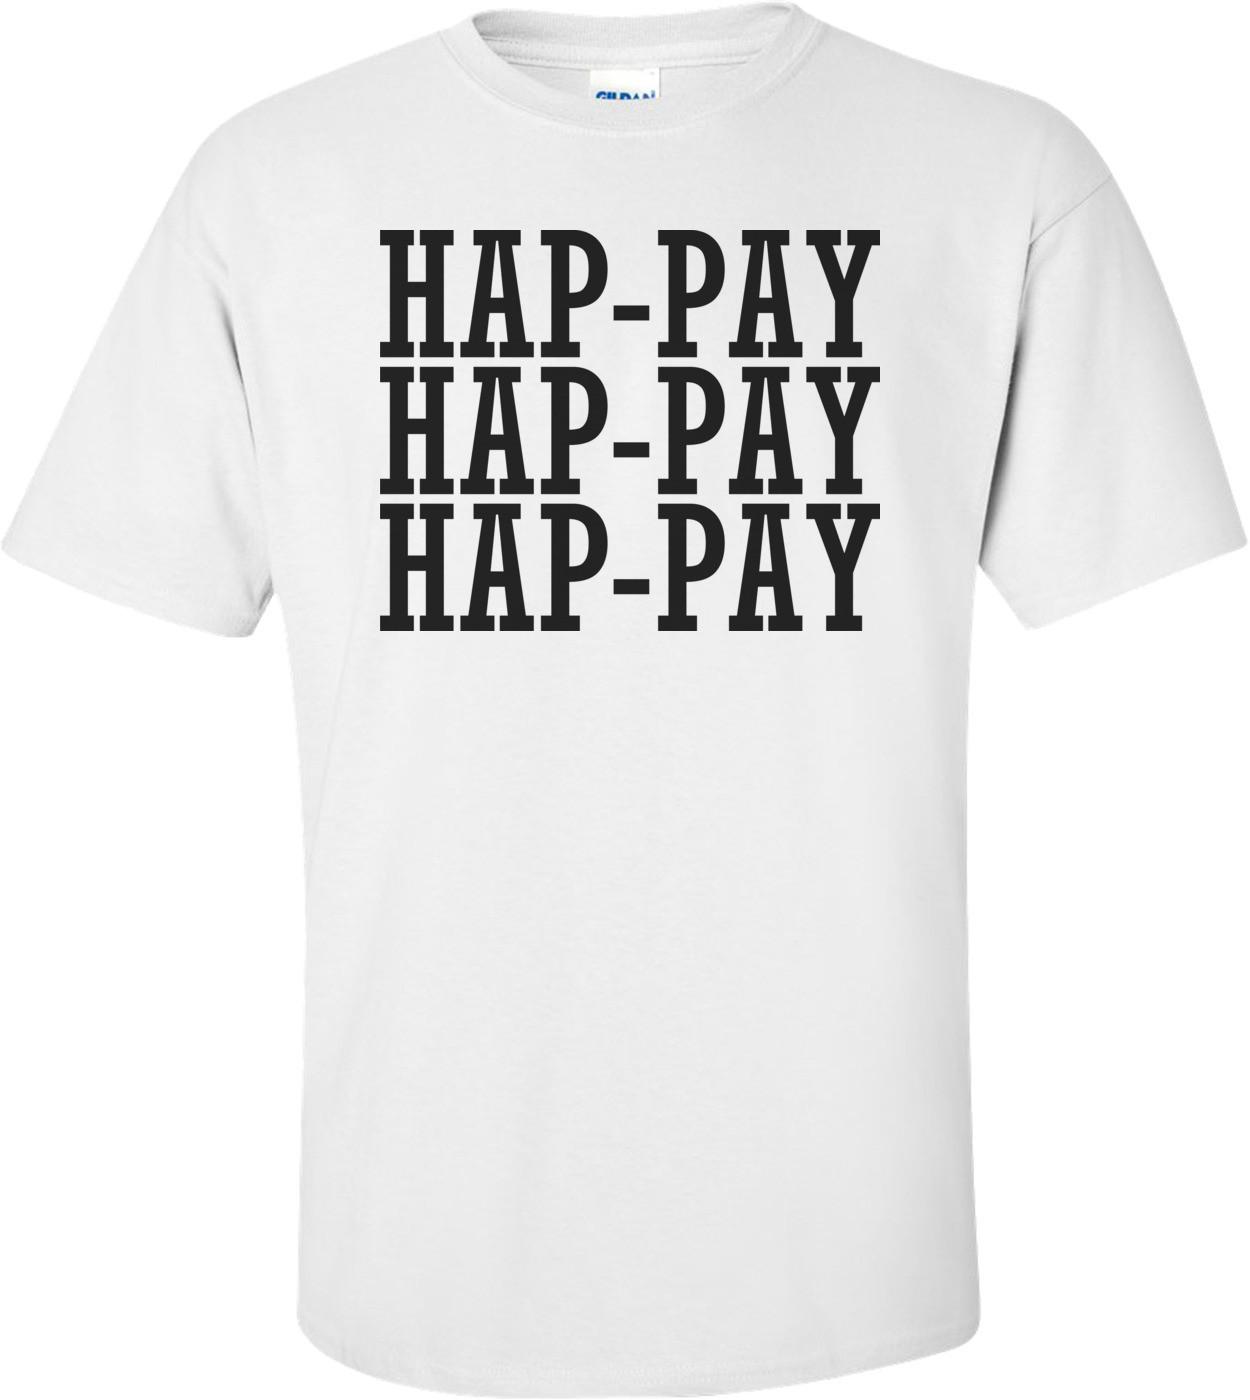 Hap-pay Duck Dynasty Shirt